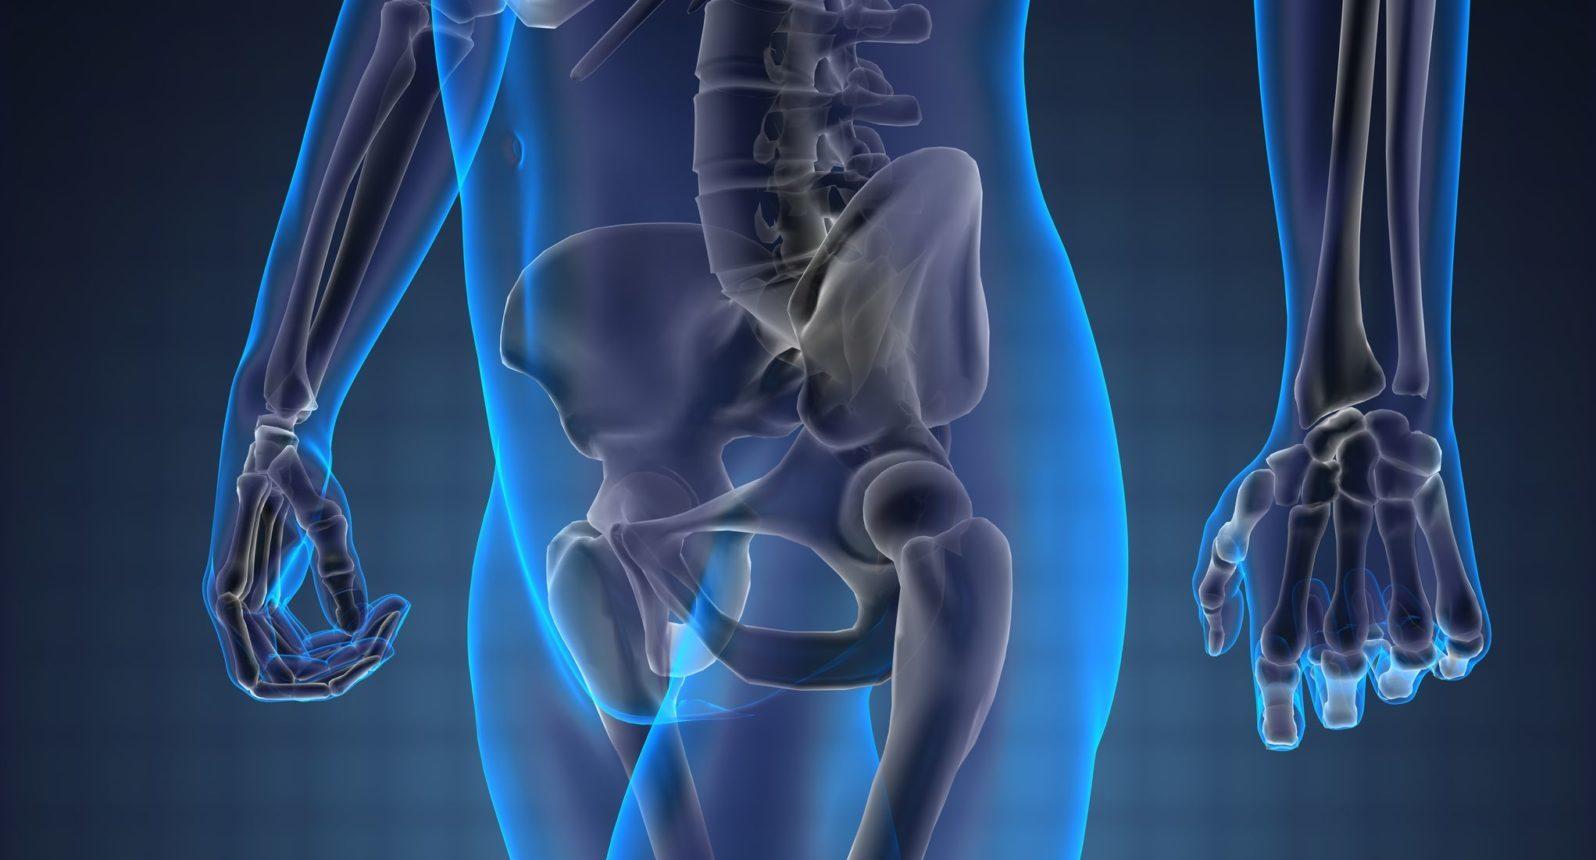 Functional hip assessment